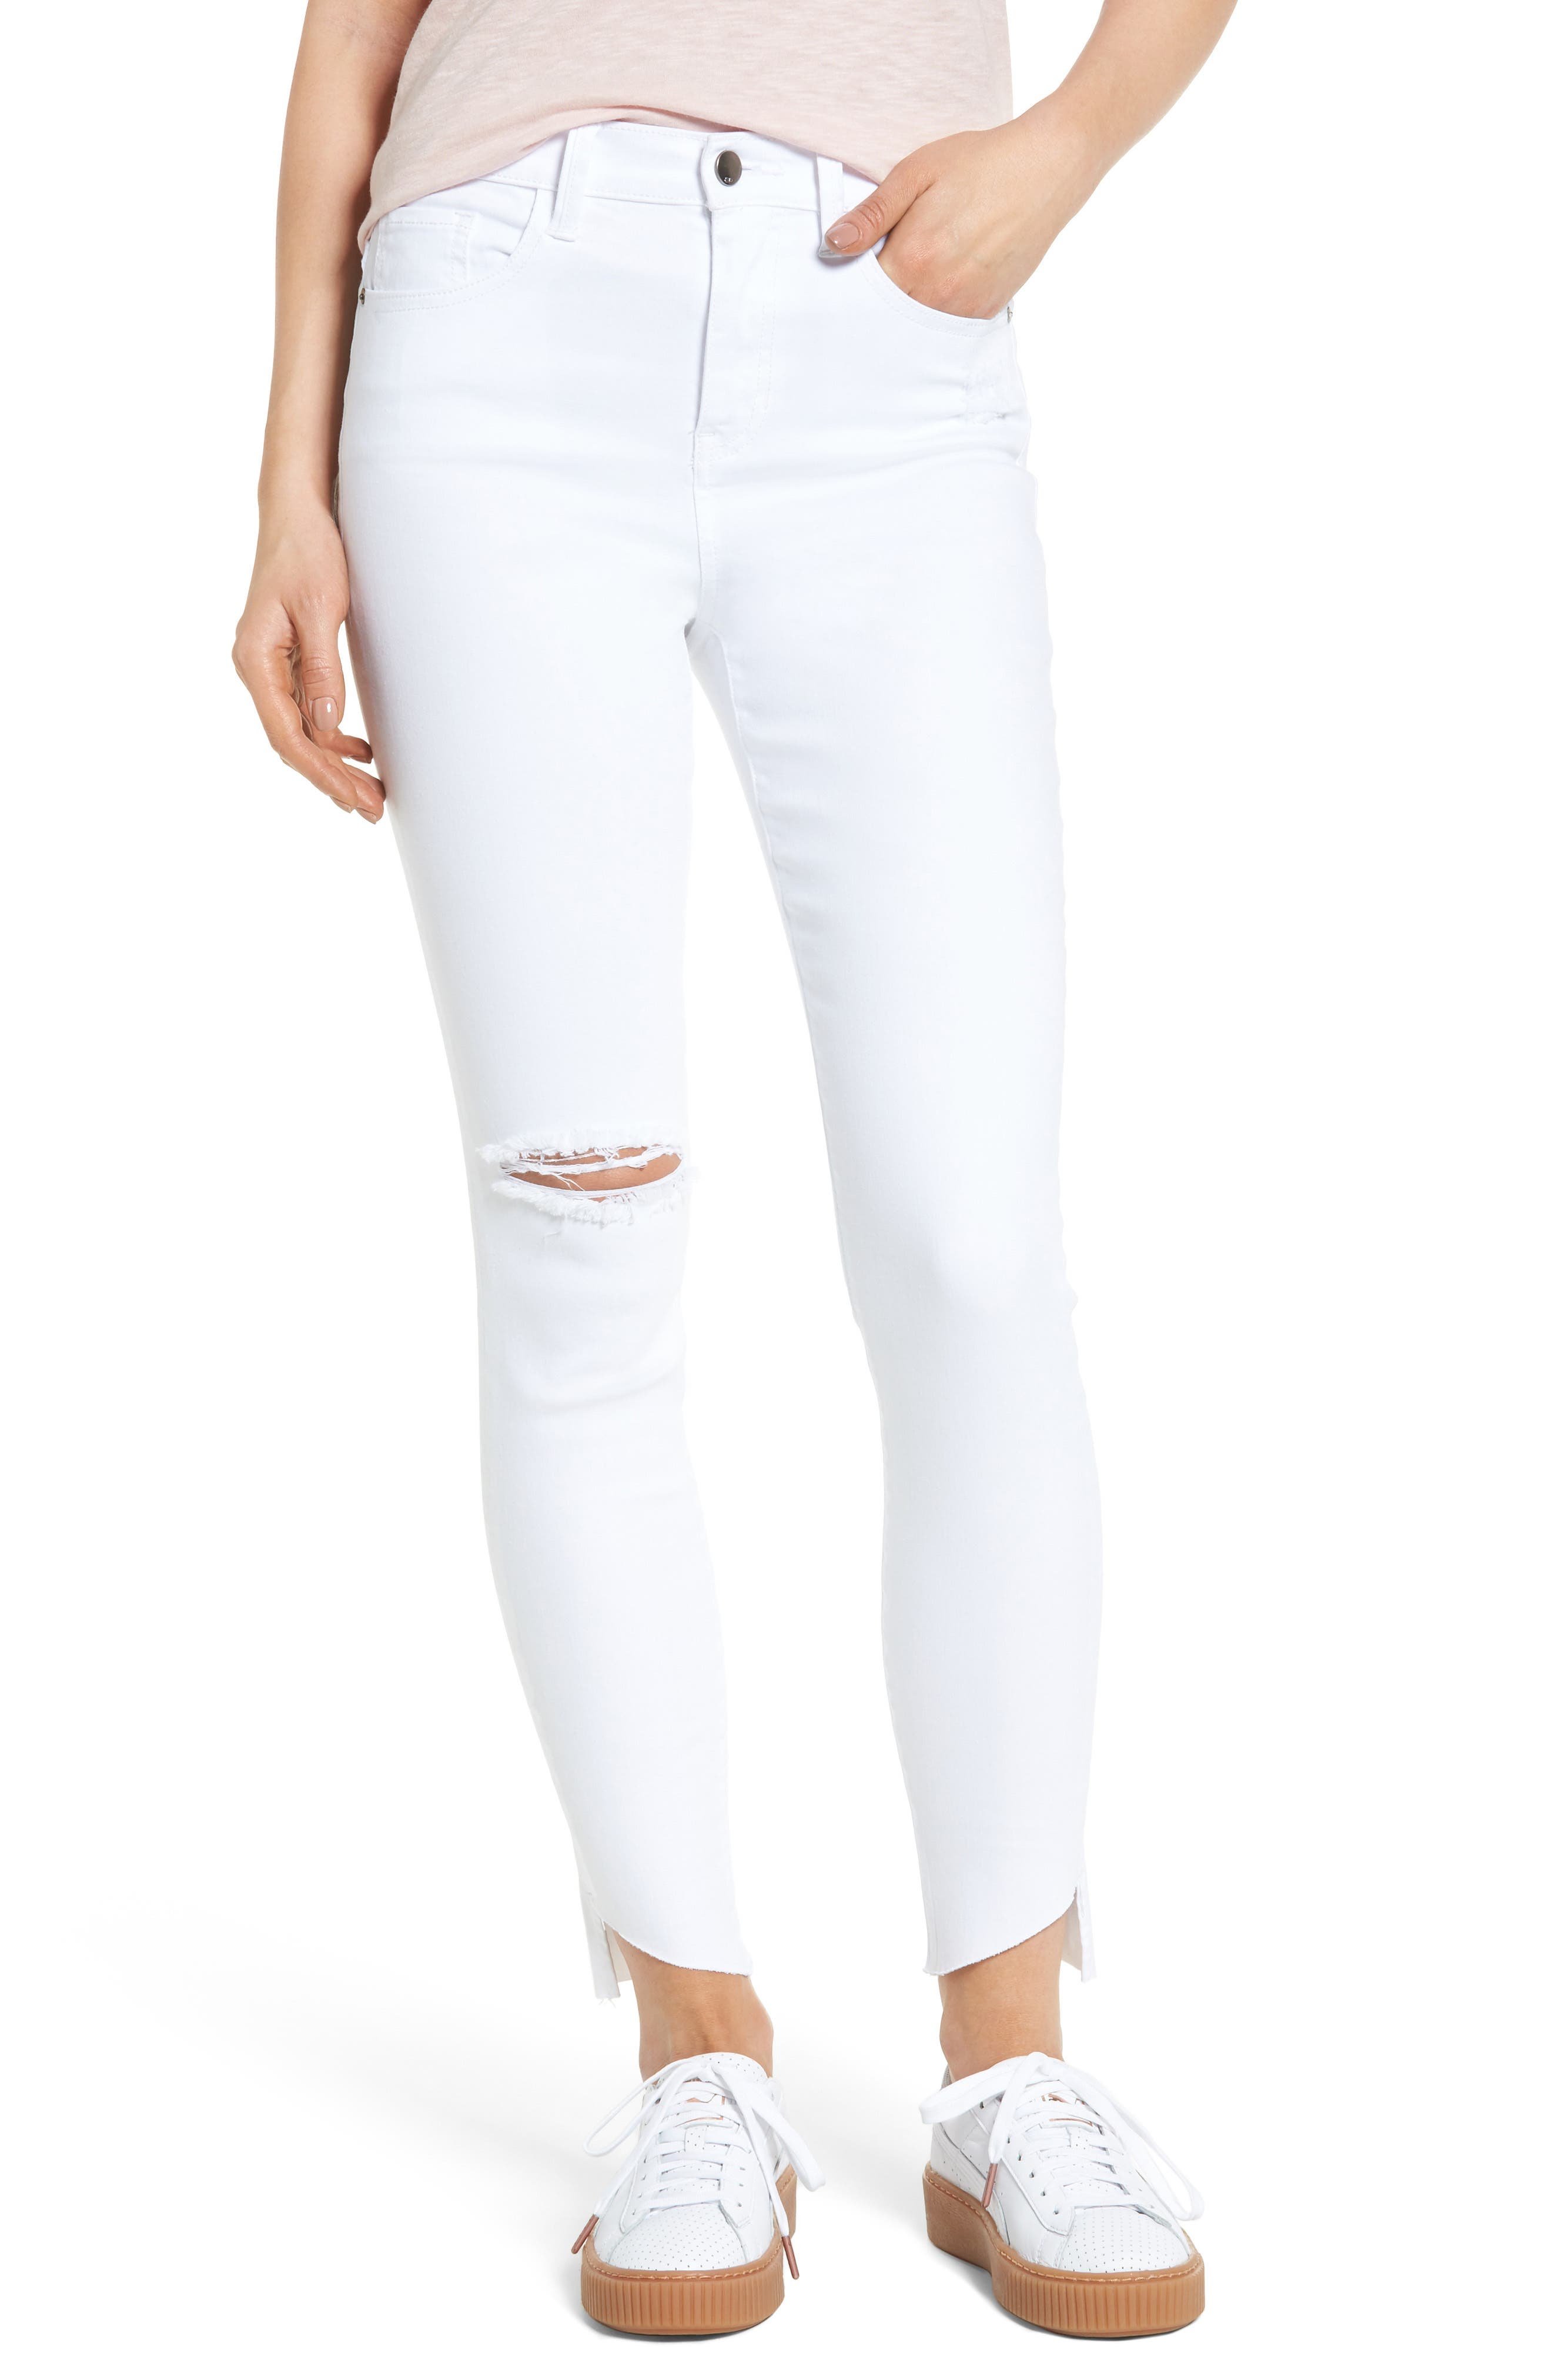 Alternate Image 1 Selected - SP Black Angled Step Hem Skinny Jeans